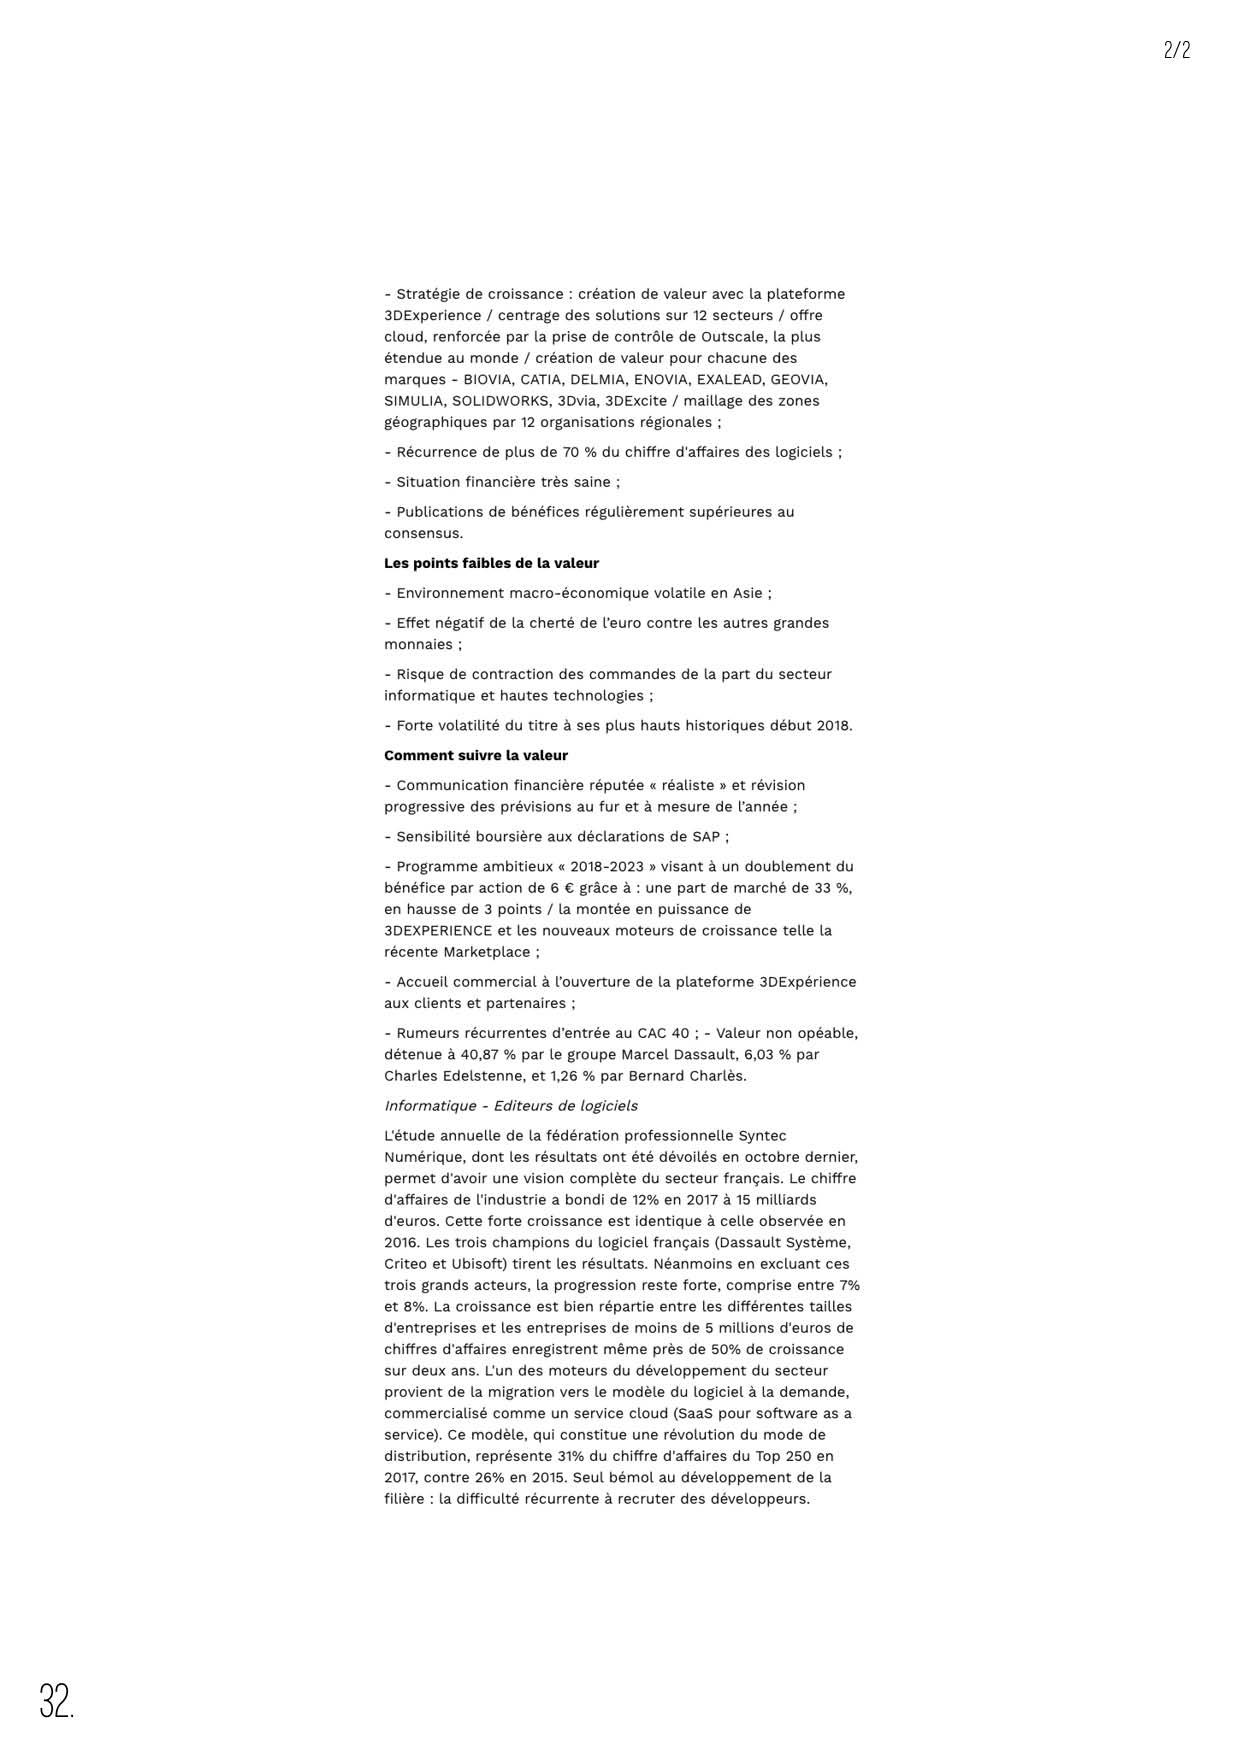 19.05.BOOKMEDIA32.jpg